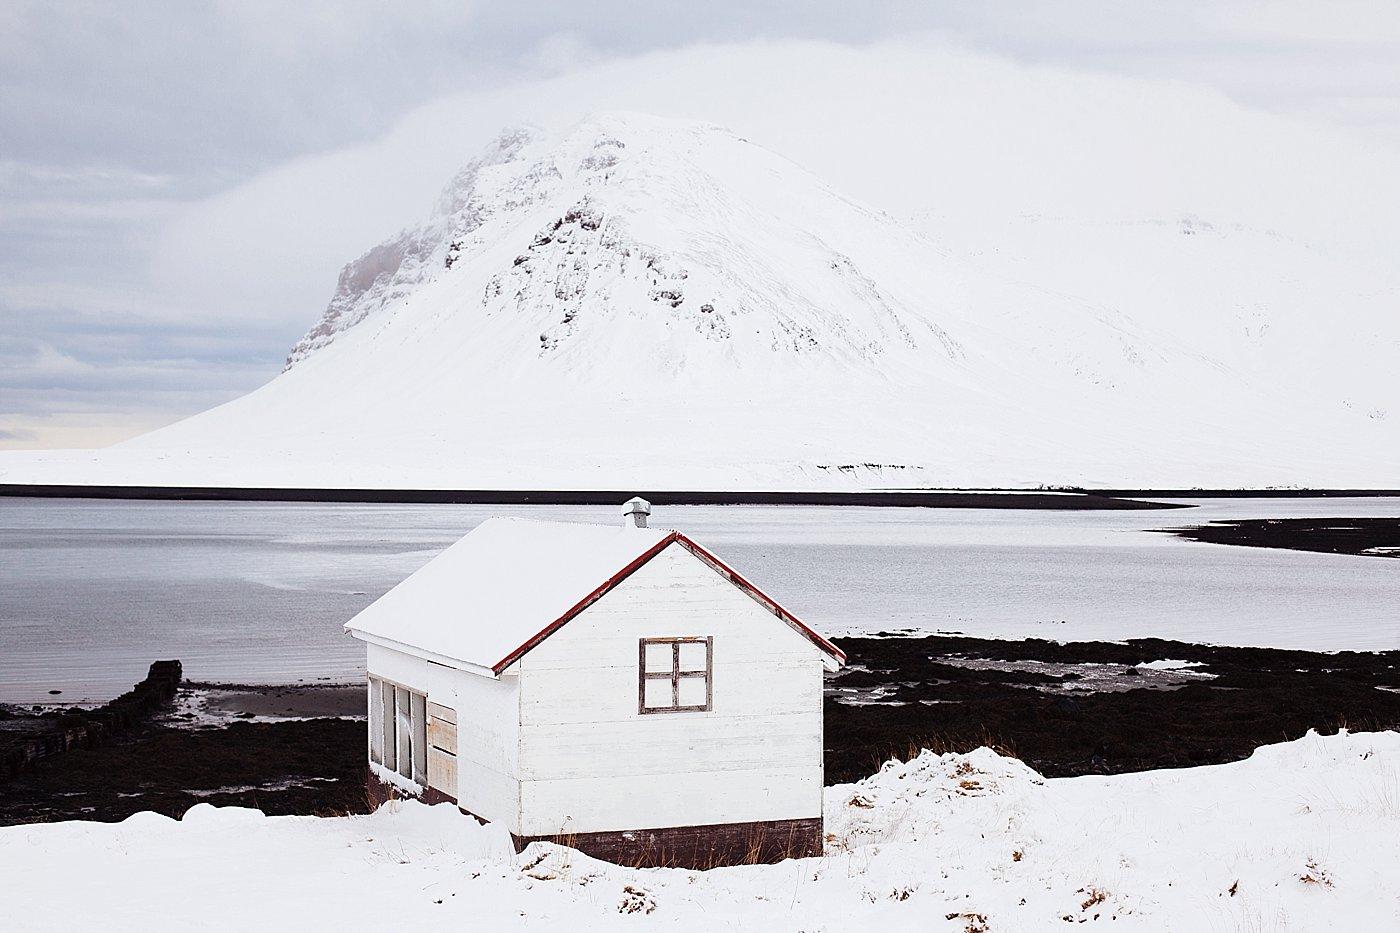 APitts_Iceland-4043 copy.jpg